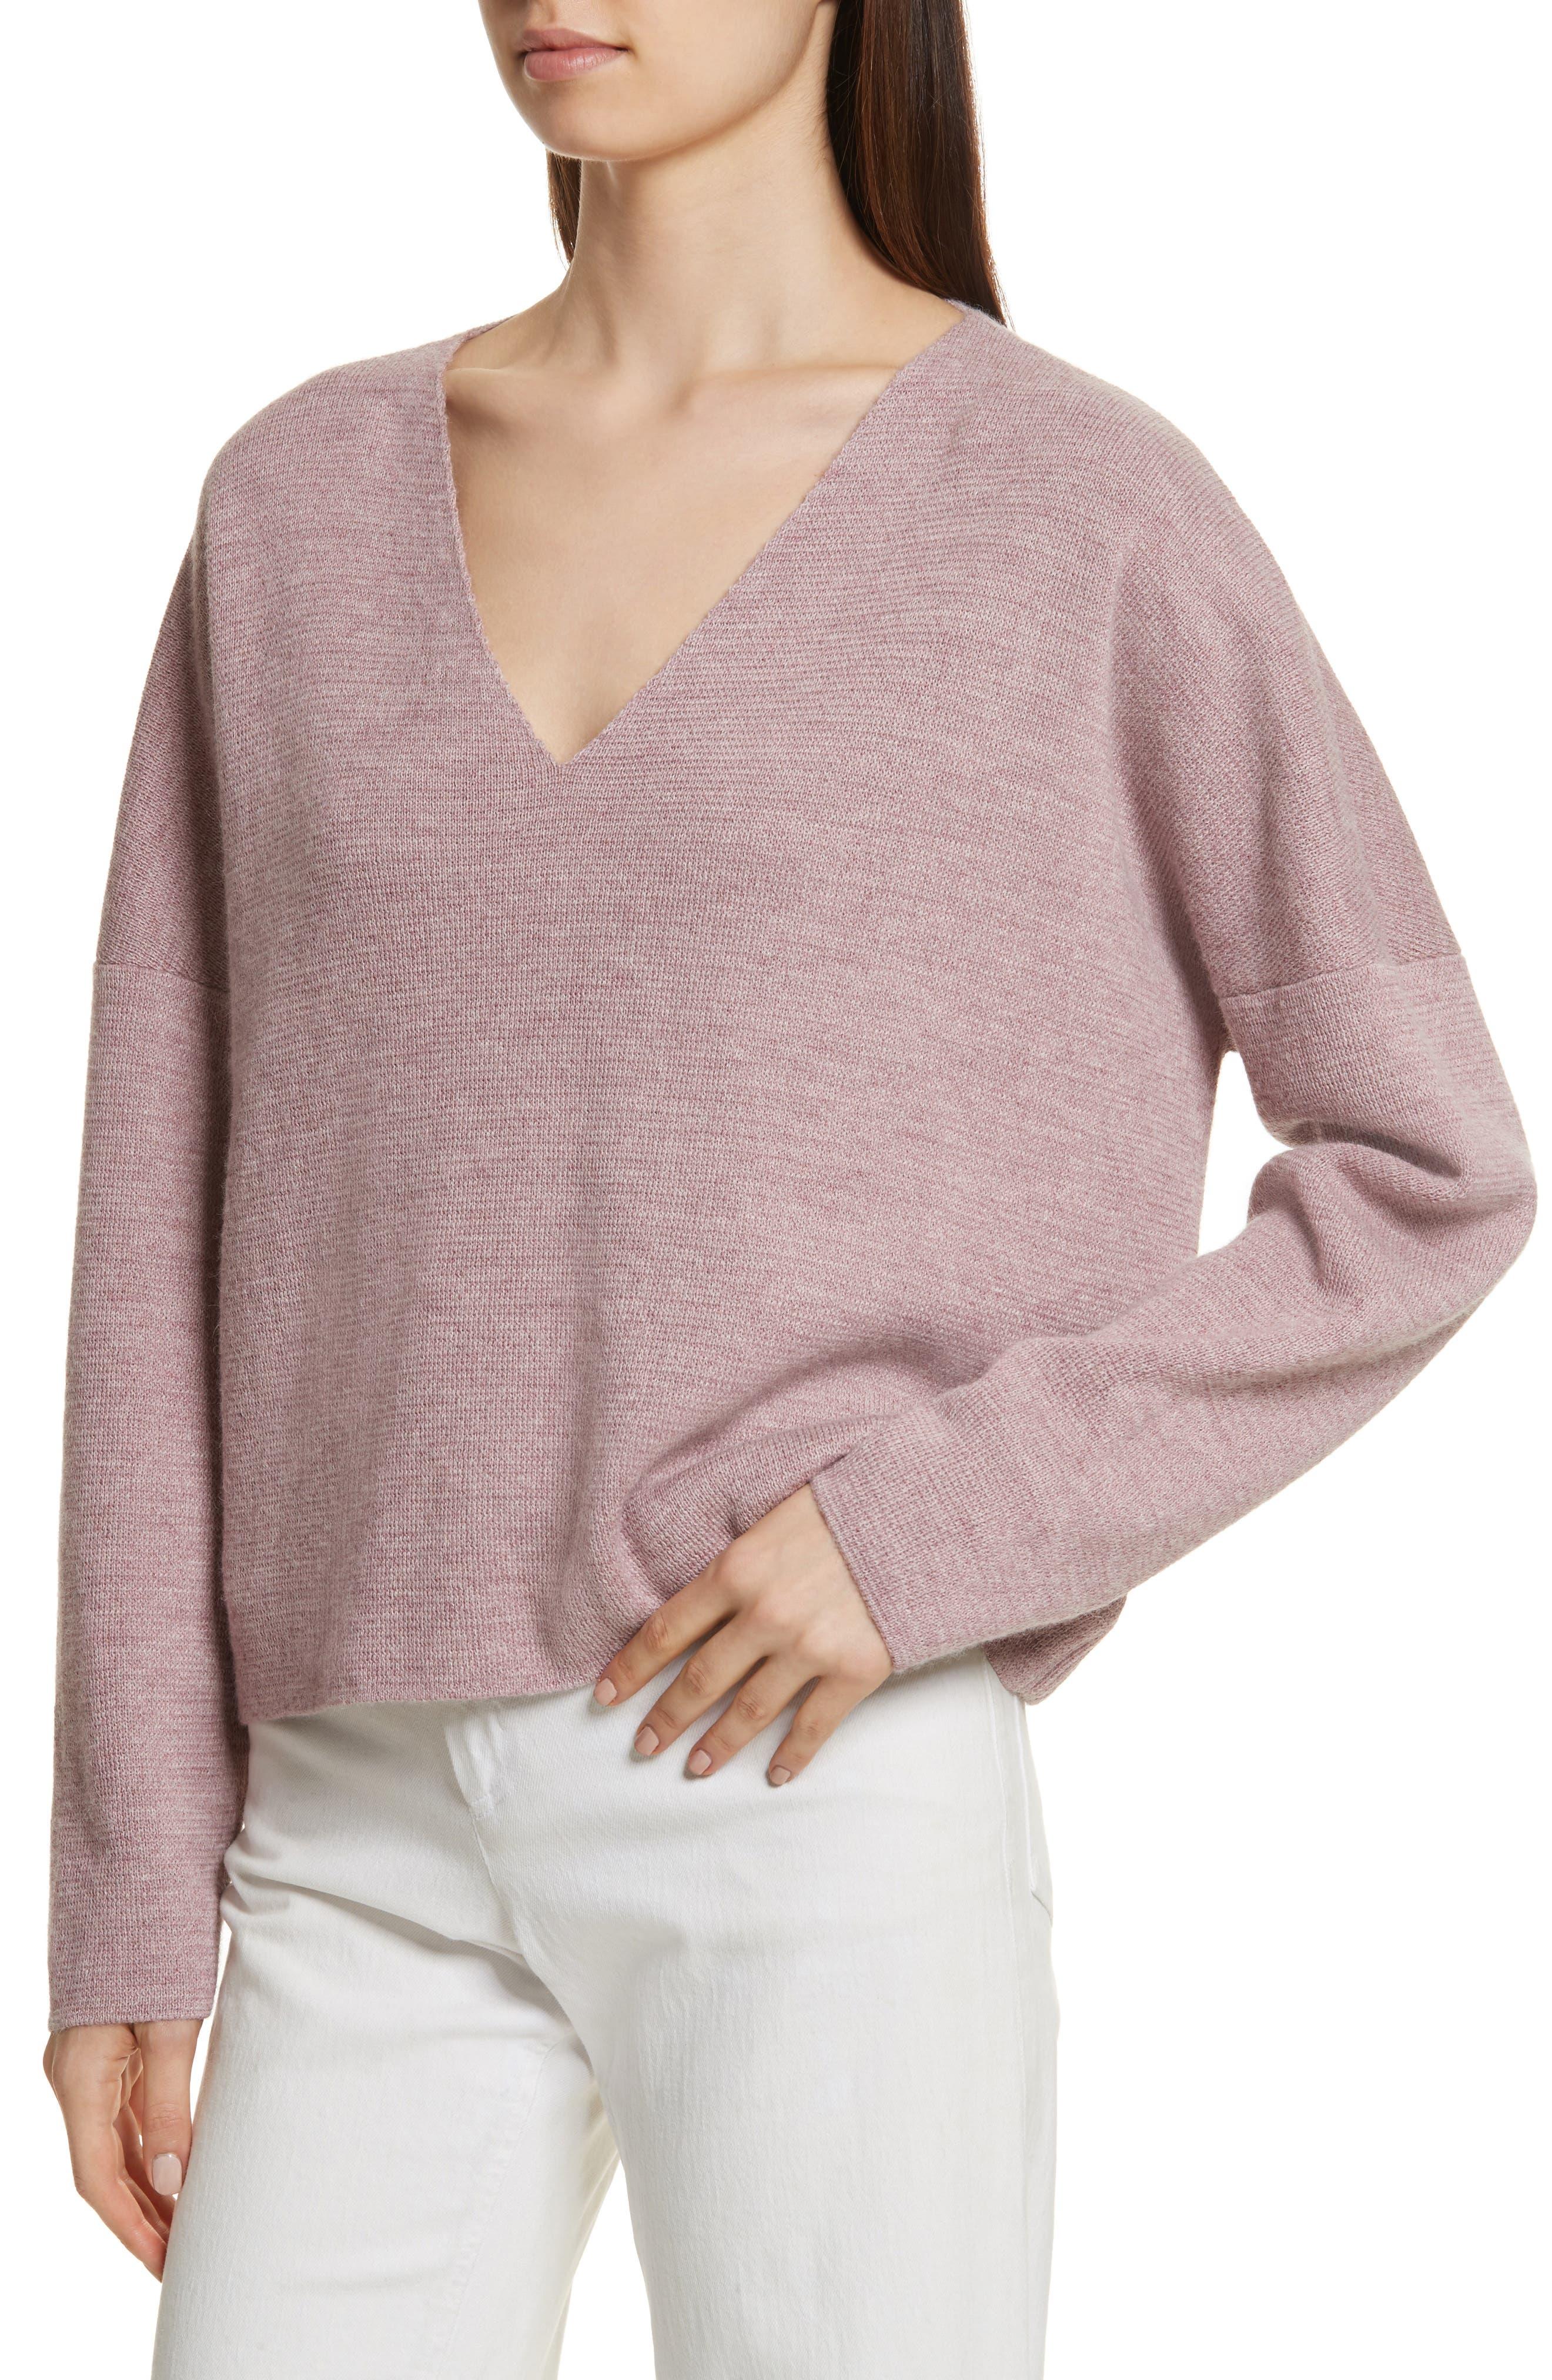 Fount Alpaca Hair Sweater,                             Alternate thumbnail 4, color,                             Lilac